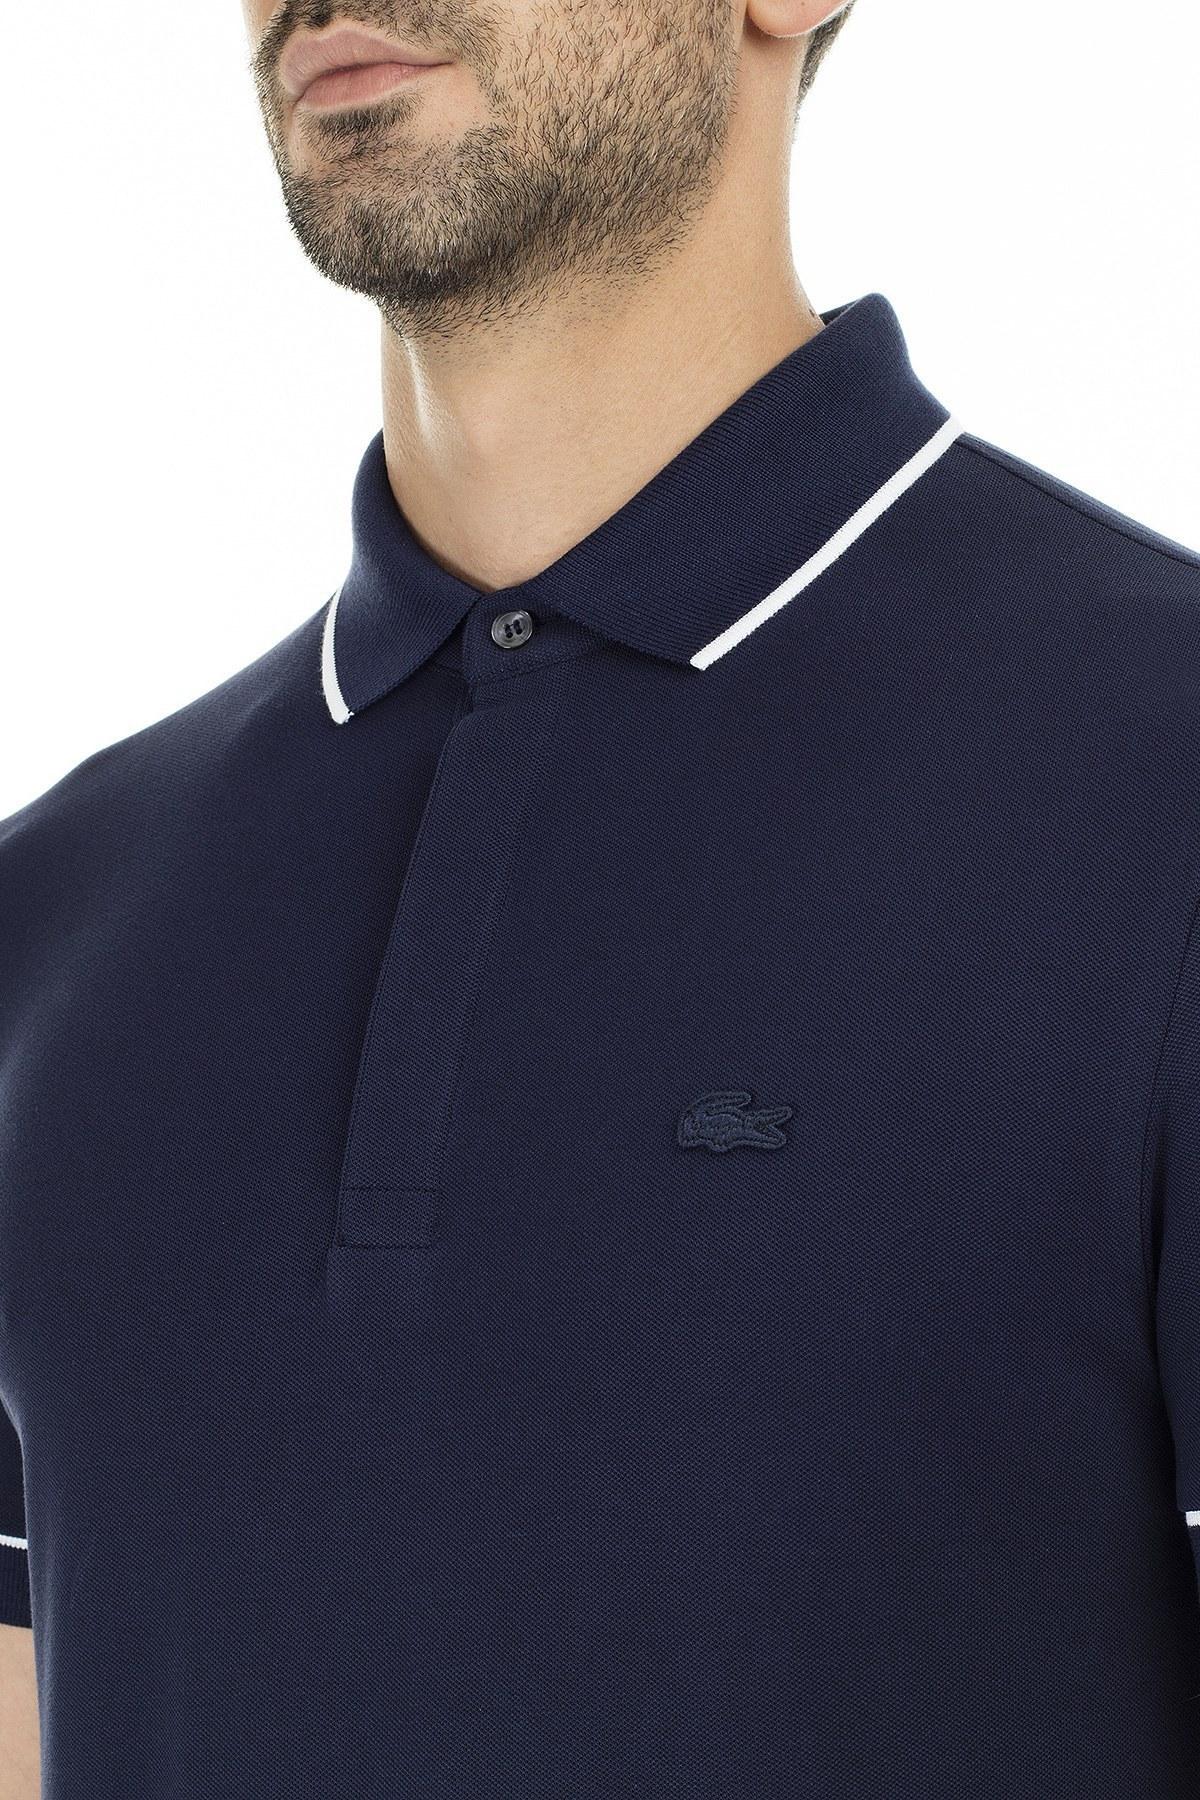 Lacoste Pamuklu Regular Fit T Shirt Erkek Polo PH4275 525 LACİVERT